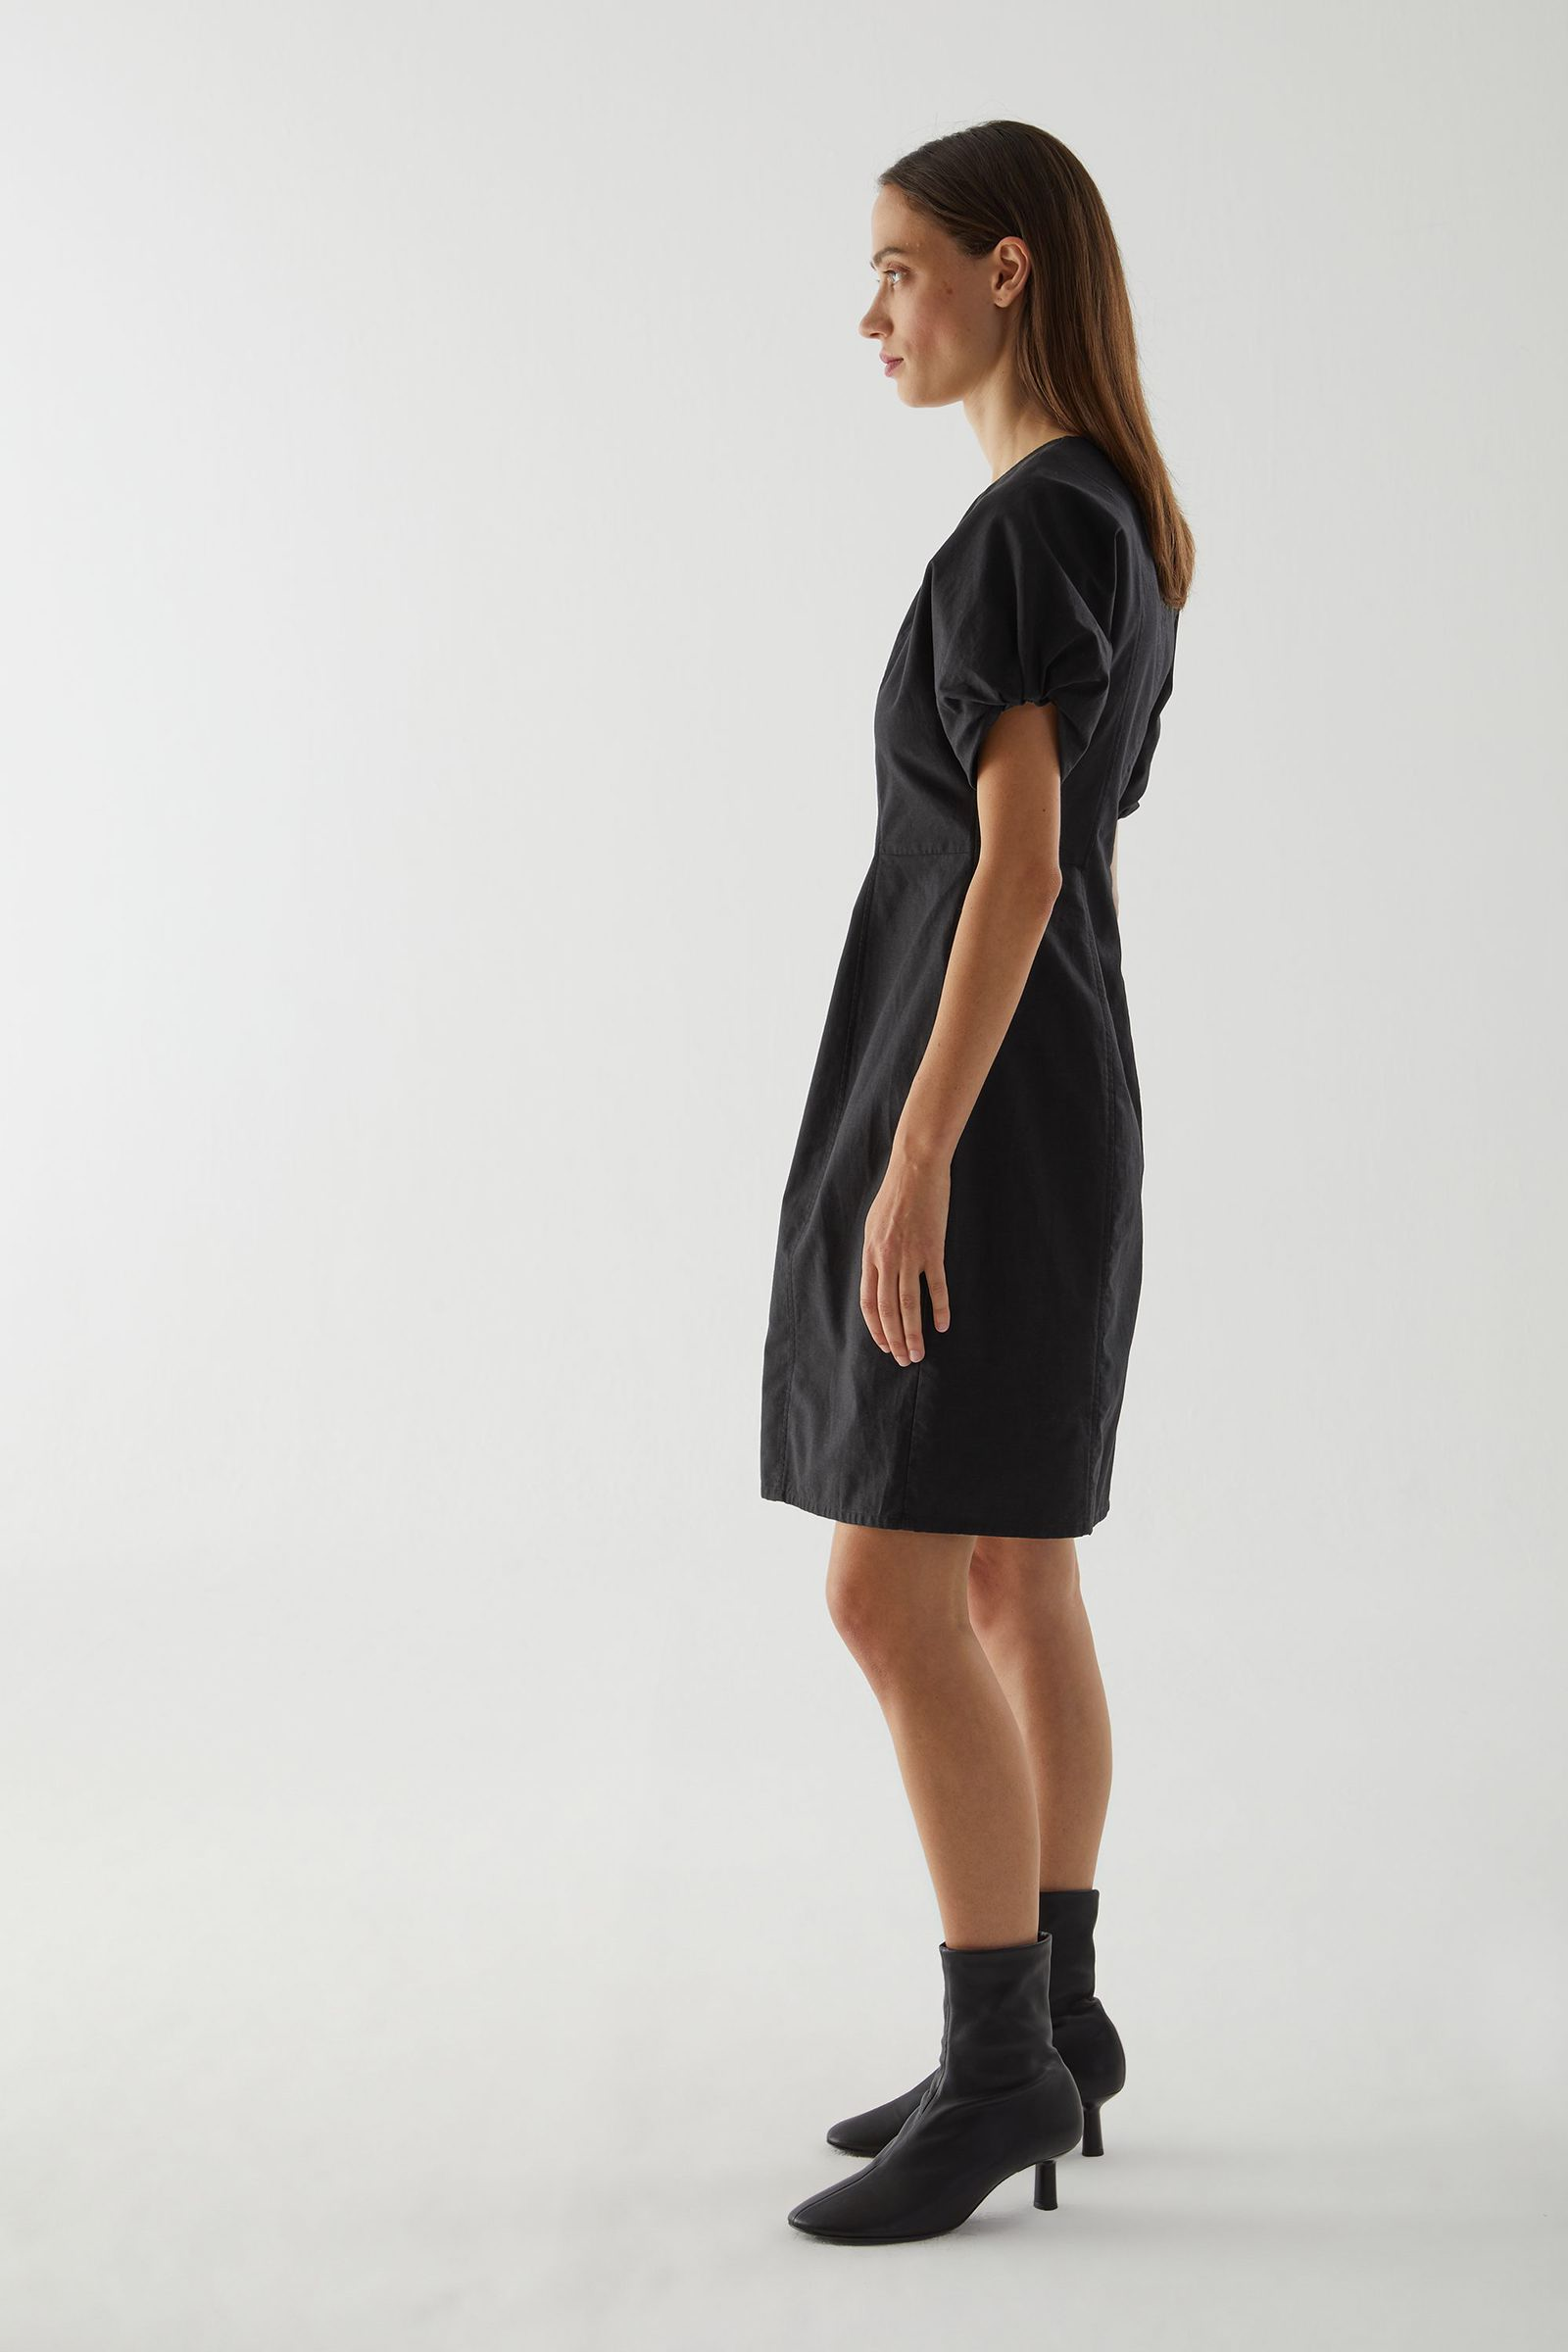 COS 스컬프티드 코튼 퍼프 슬리브 드레스의 블랙컬러 ECOMLook입니다.